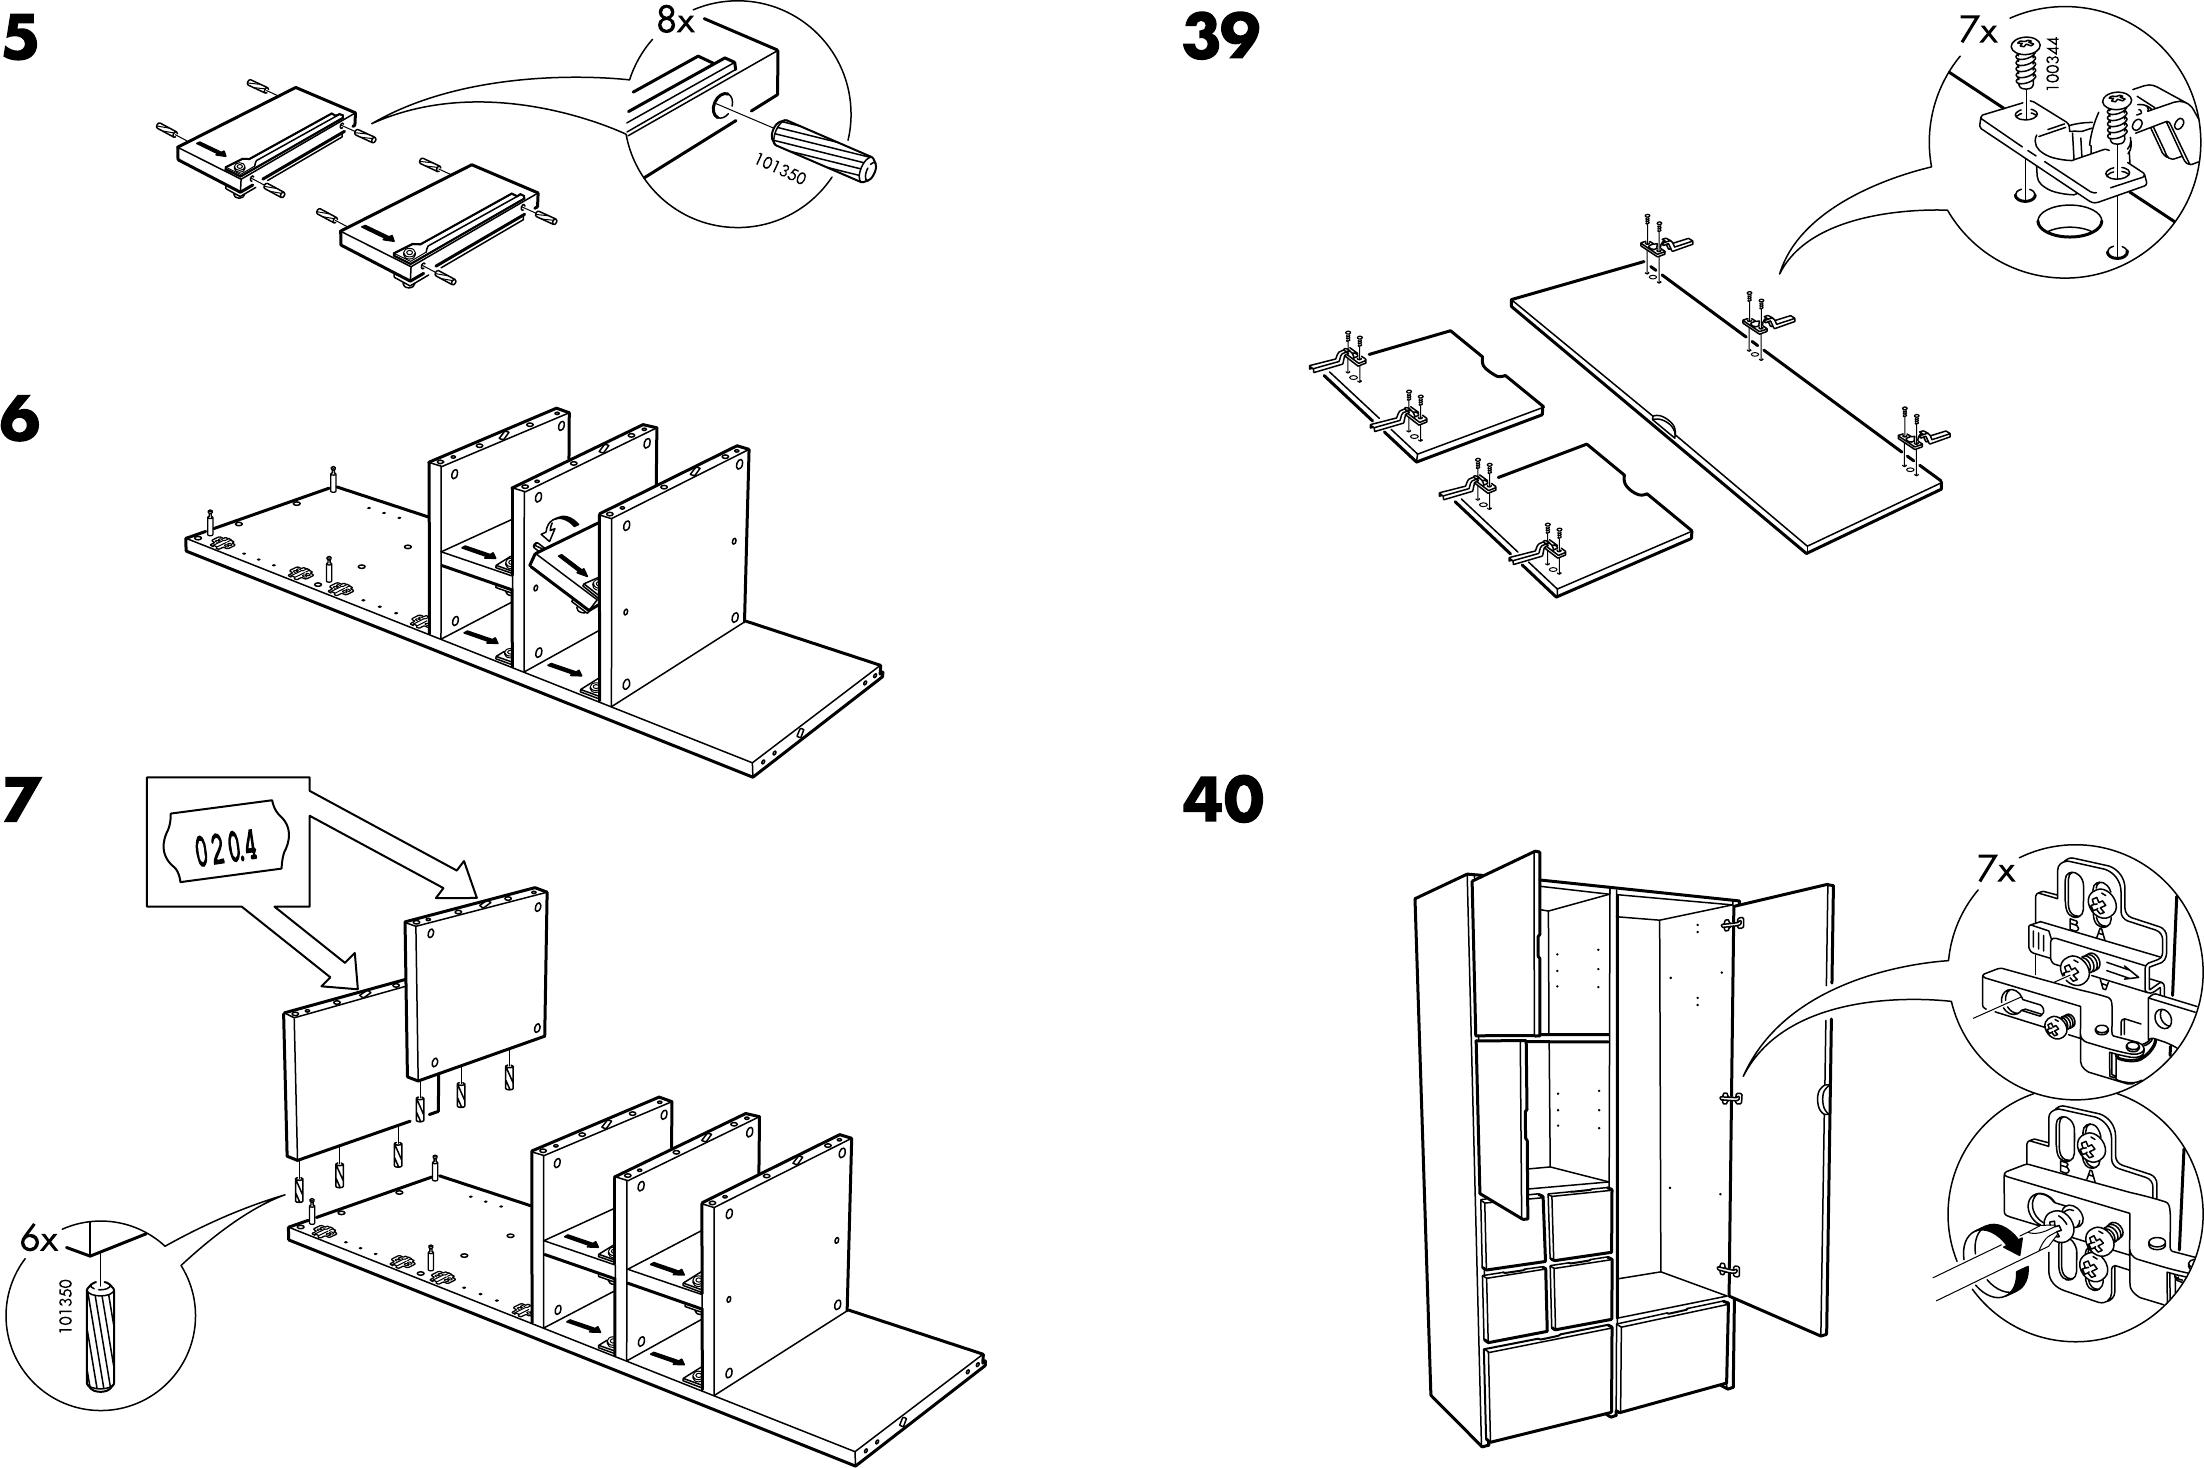 Expedit Ikea Kast Handleiding ~ Handleiding Ikea Rakke kast (pagina 6 van 12) (Dansk, Deutsch, English